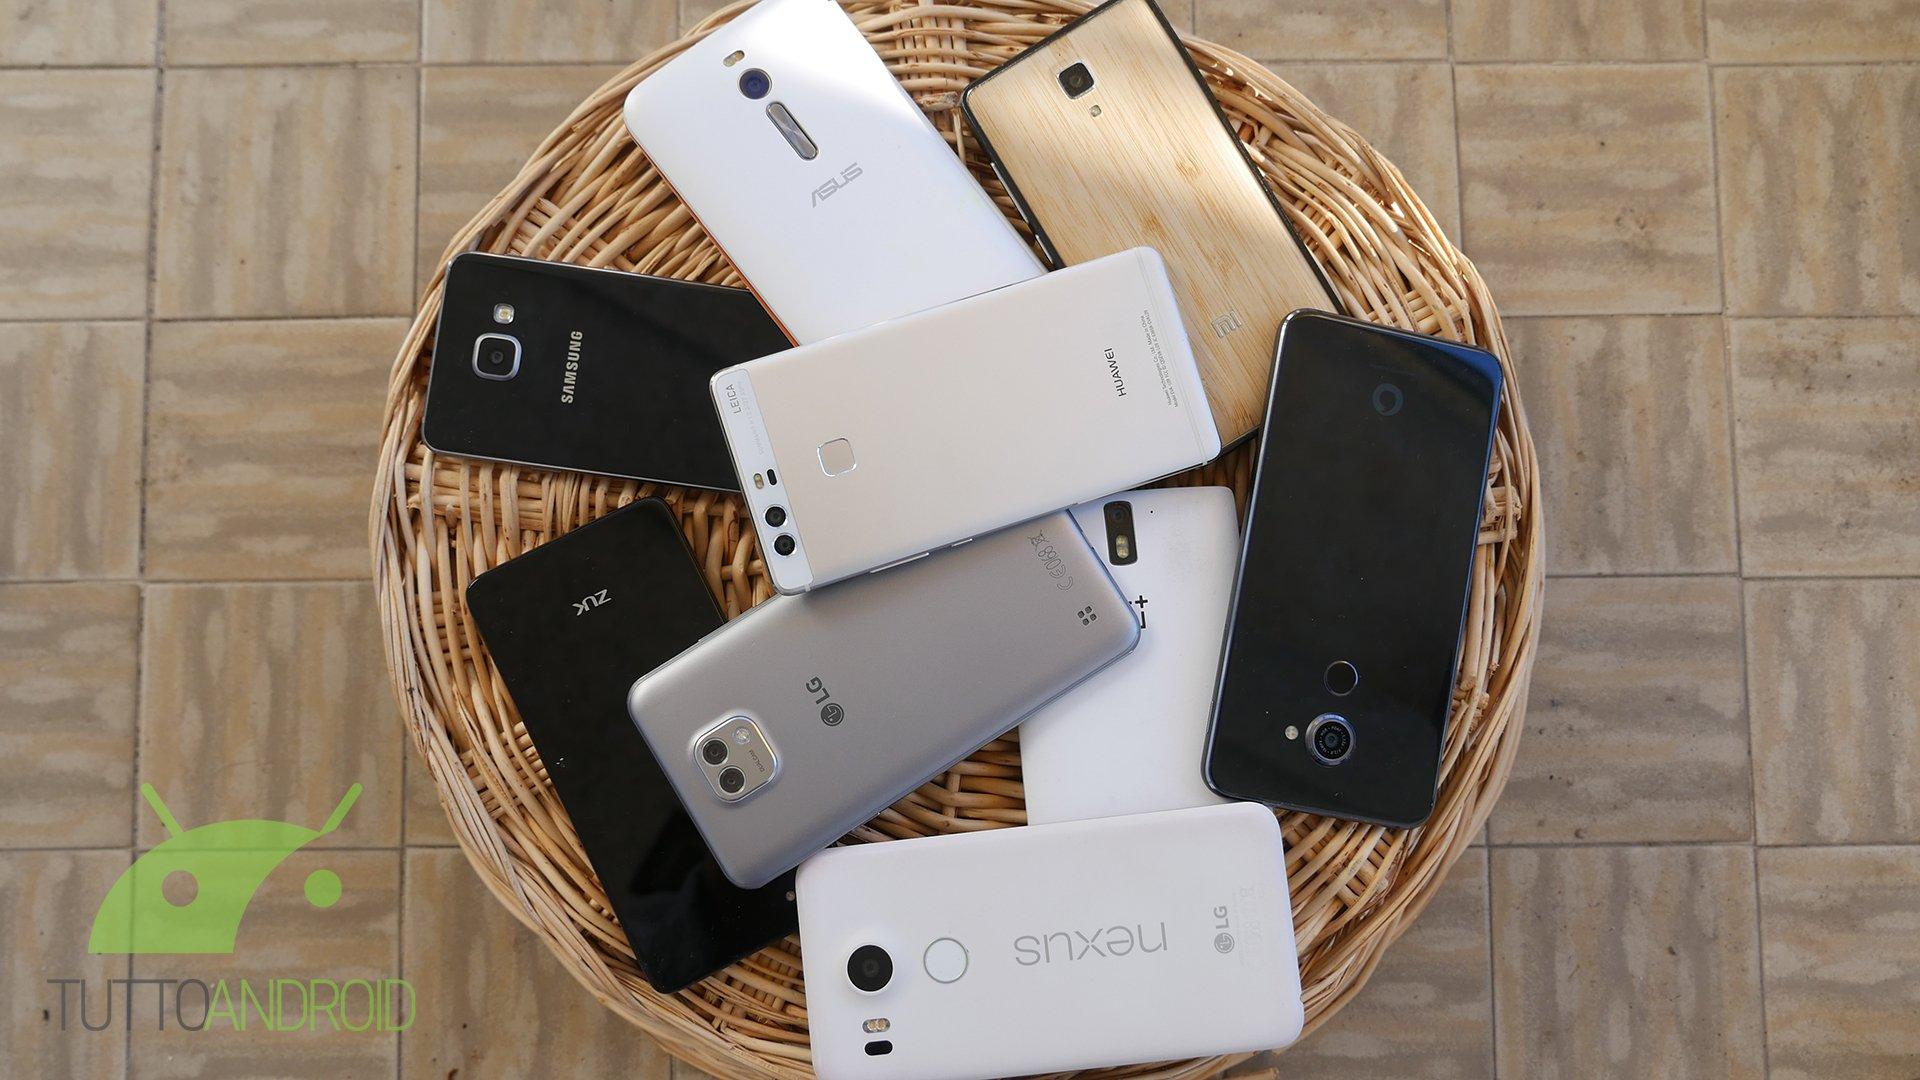 Smartphone in offerta 7 ottobre 2016: LG G5, Galaxy S7, Honor 8, HTC 10 e altri